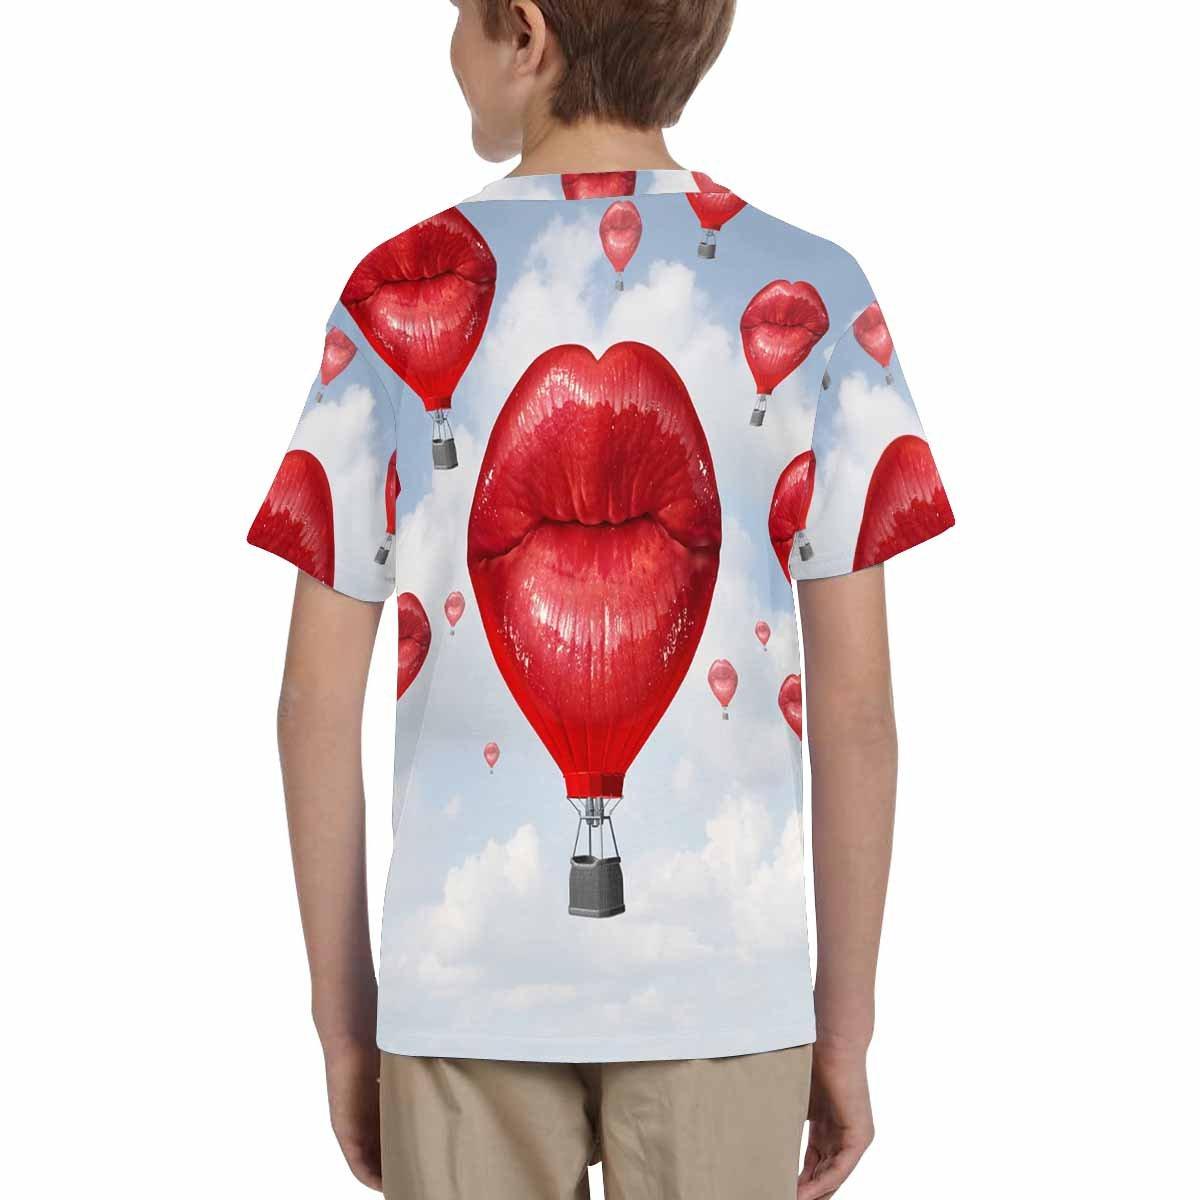 XS-XL INTERESTPRINT Red Lips Love Hot Air Balloon Youth Crew Neck T-Shirt